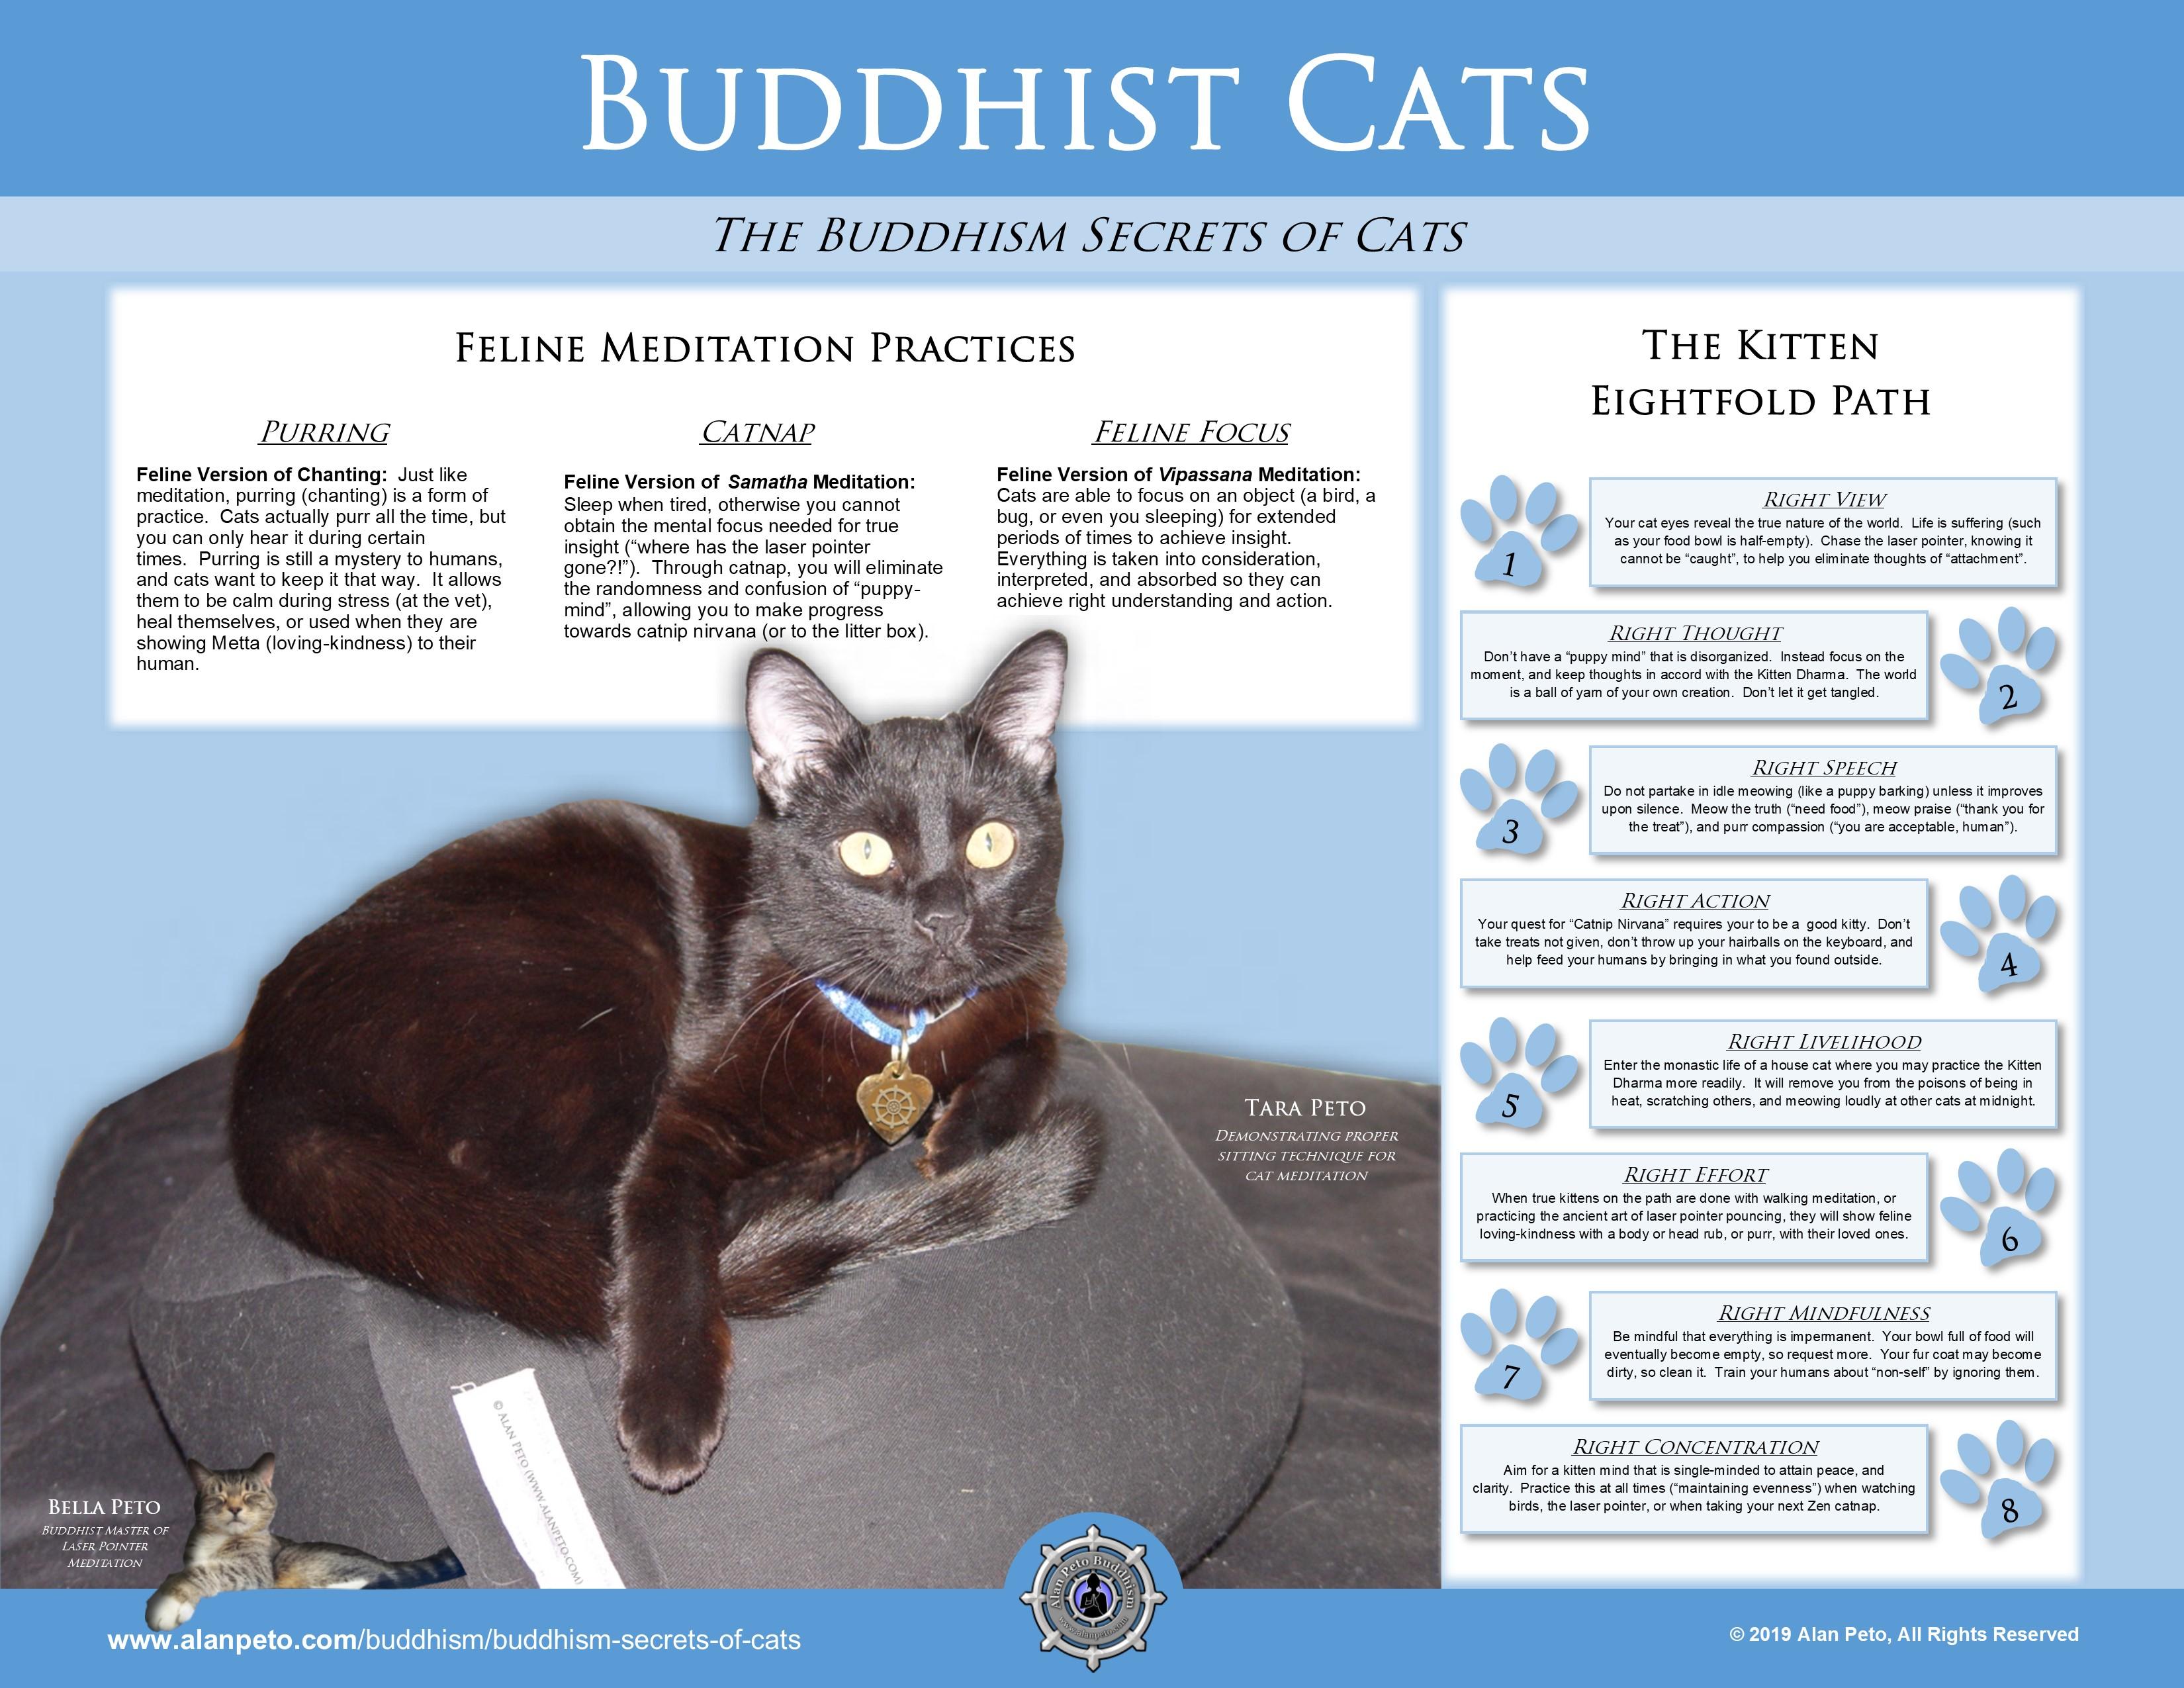 Buddhism Secrets of Cats - Alan Peto